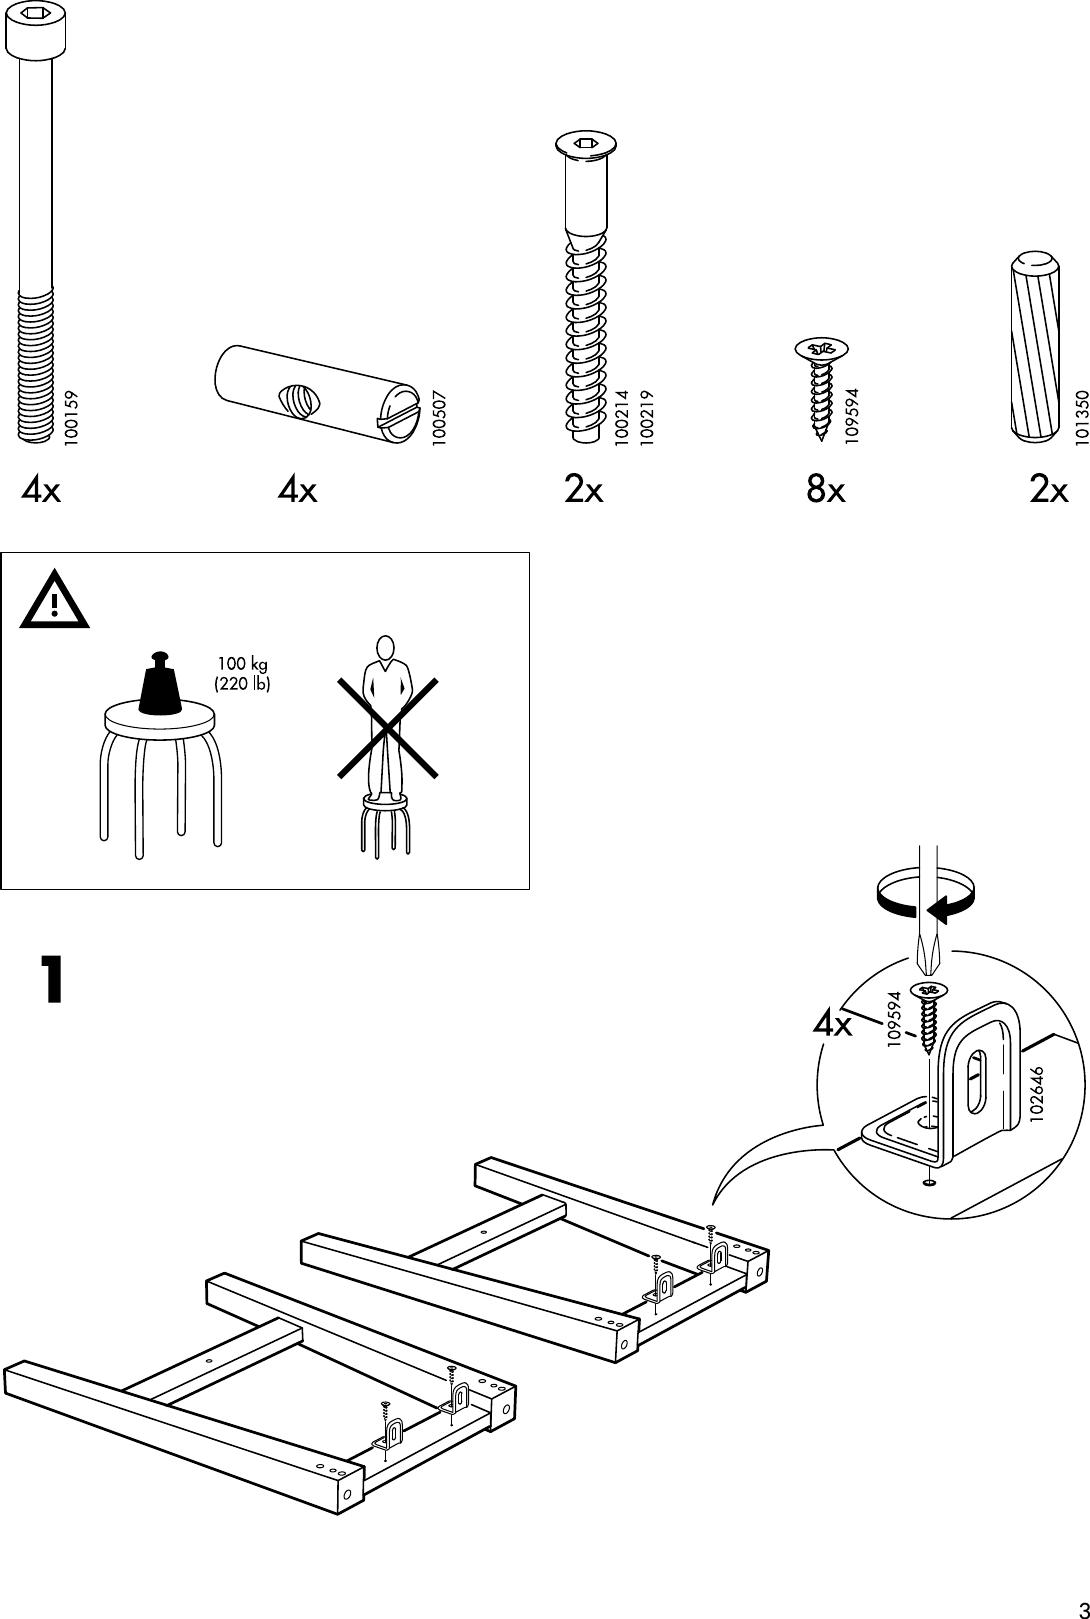 Ikea Bosse Stool Assembly Instruction